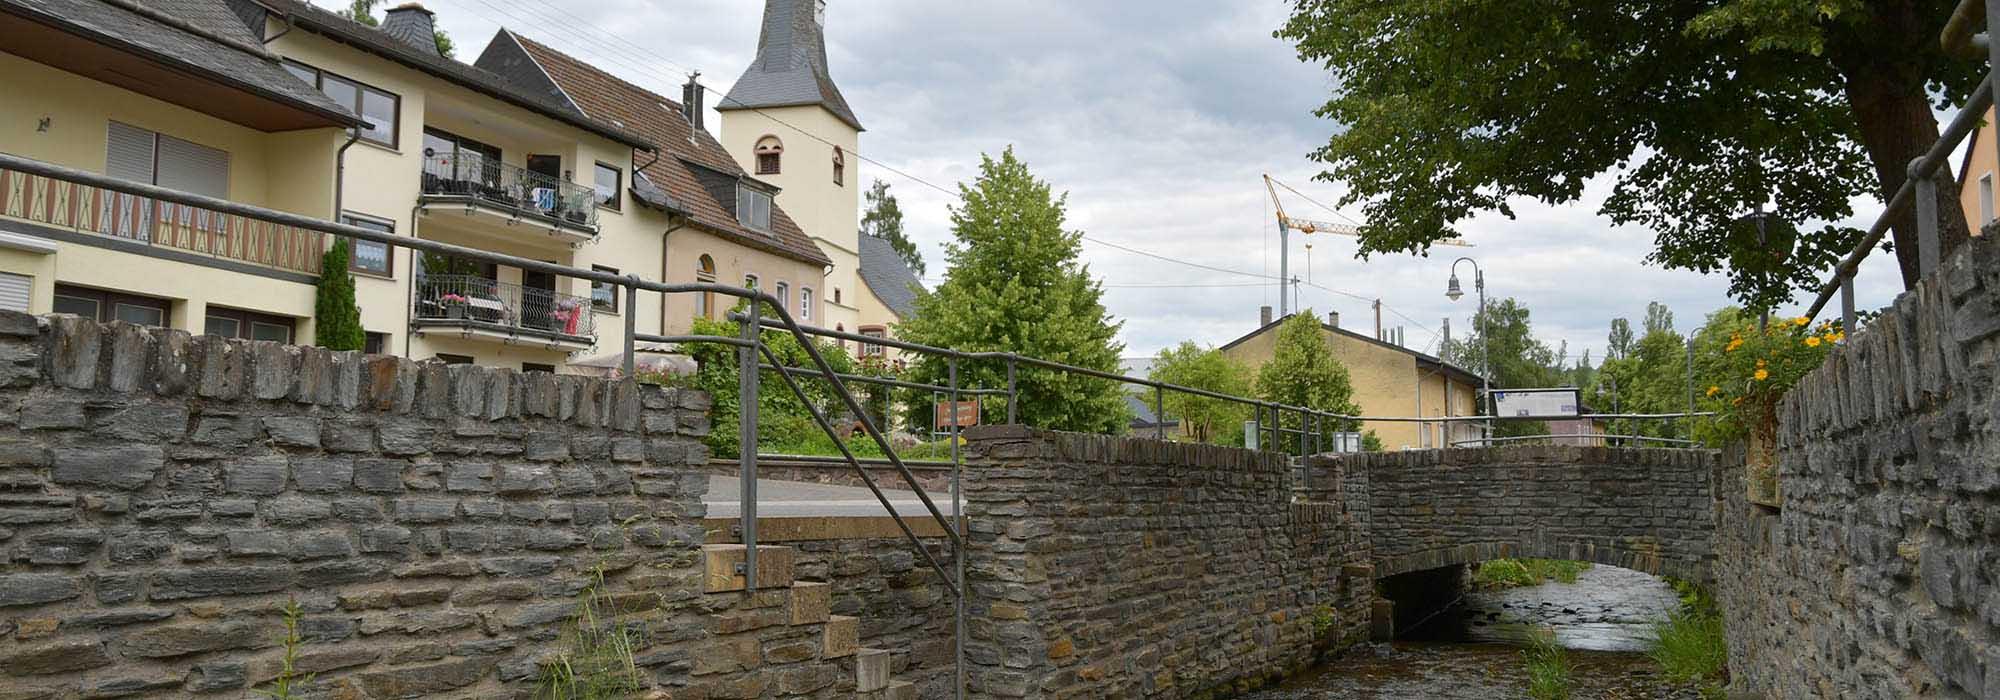 Burgen-Veldenz-ARN_4166